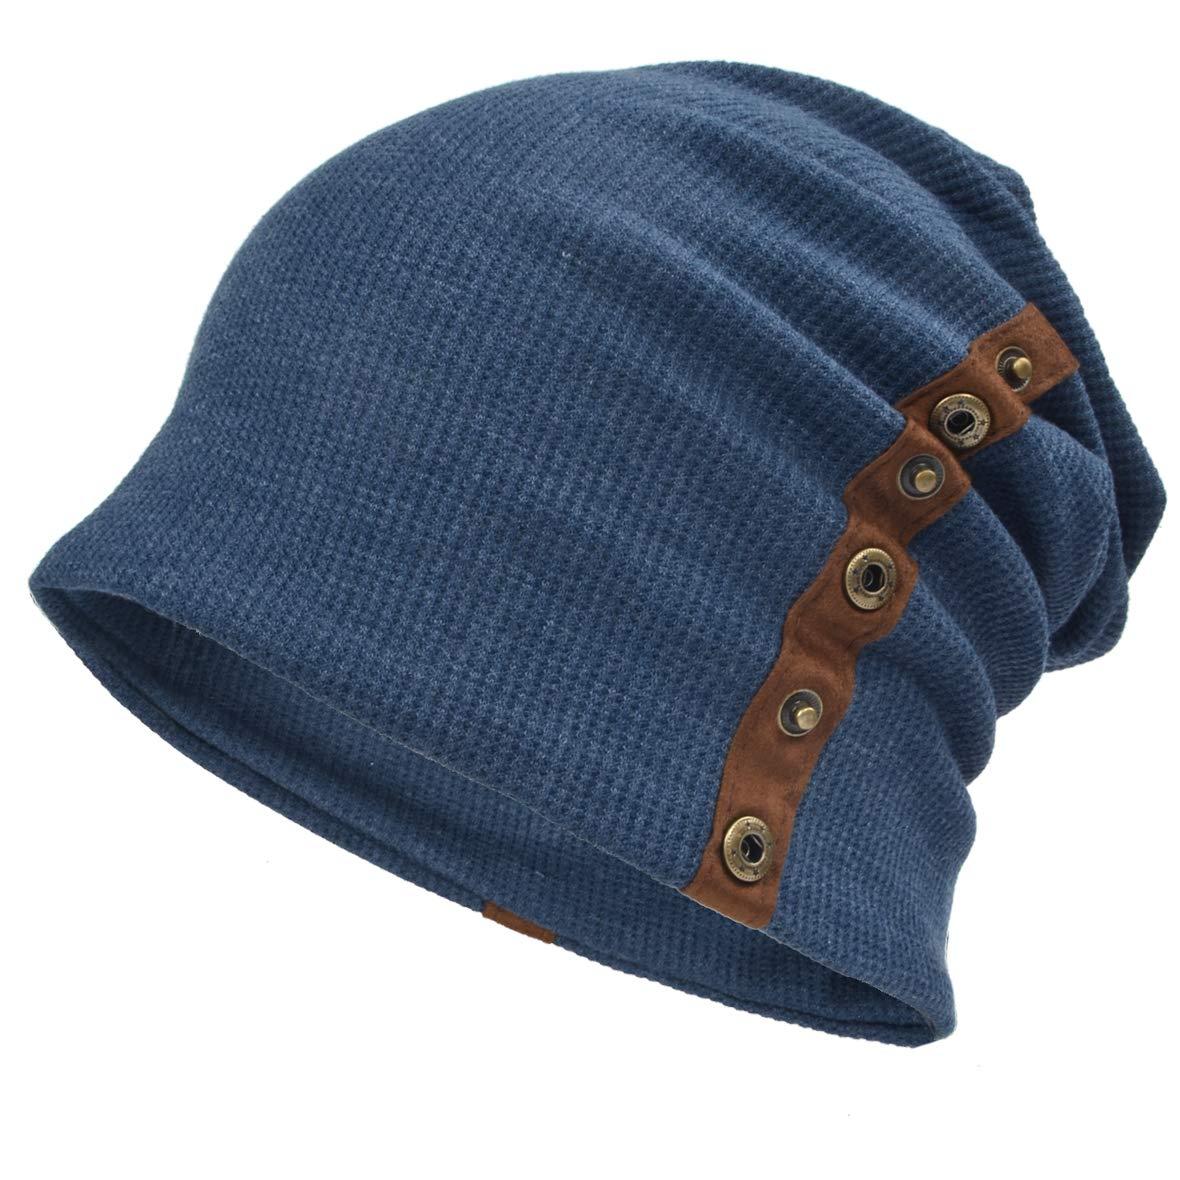 Ruphedy Men Knit Beanie Winter Slouch Skull Cap Ski Hat B020